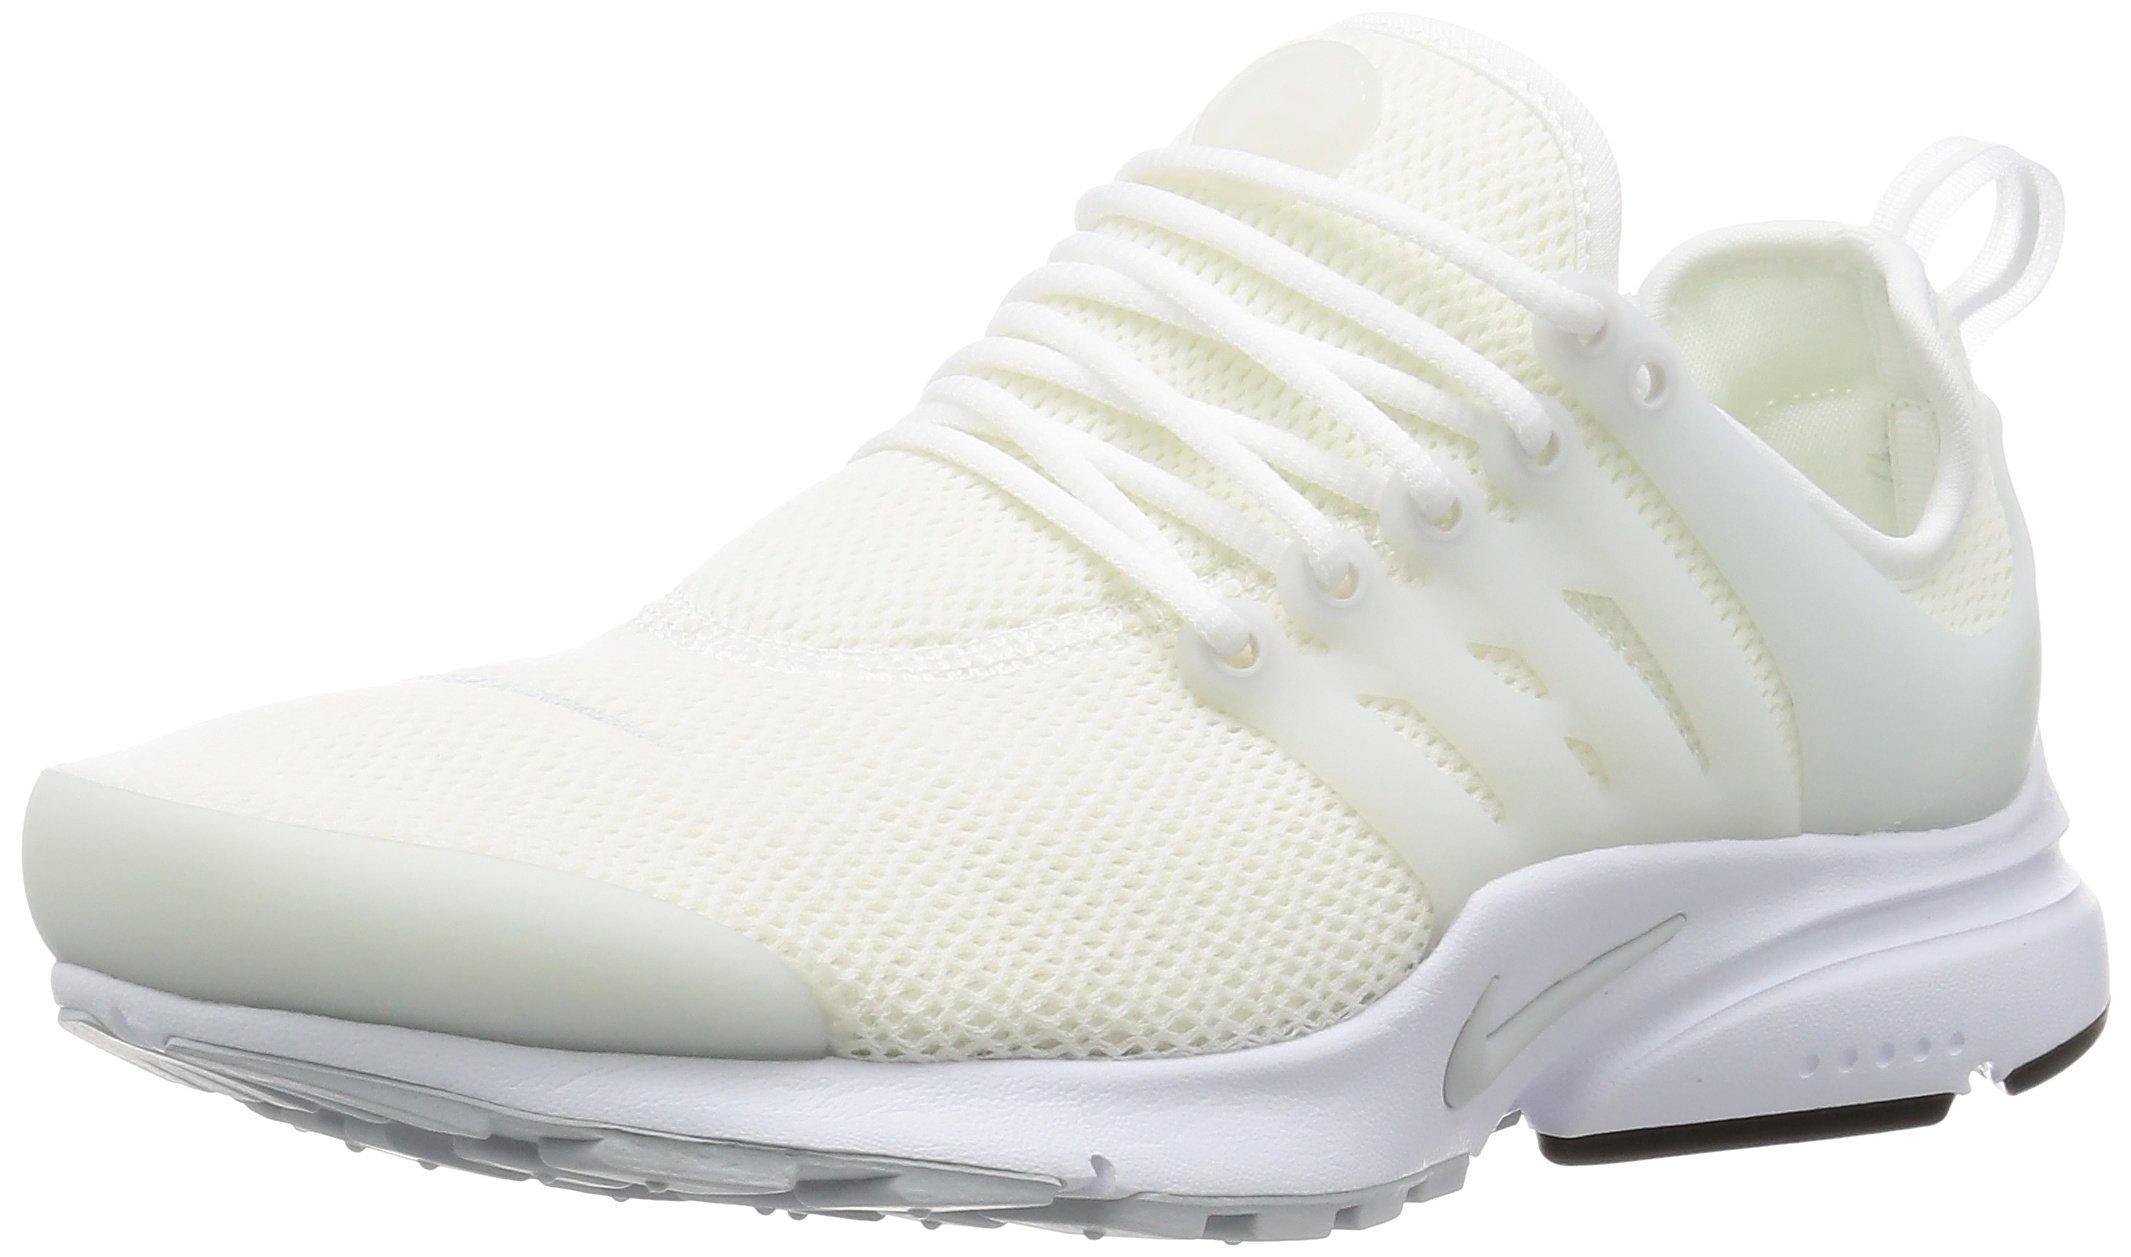 new product 71ea9 b6e33 Galleon - Nike Womens Air Presto White Pure Platinum White Running Shoe Sz,  7 B(M) US